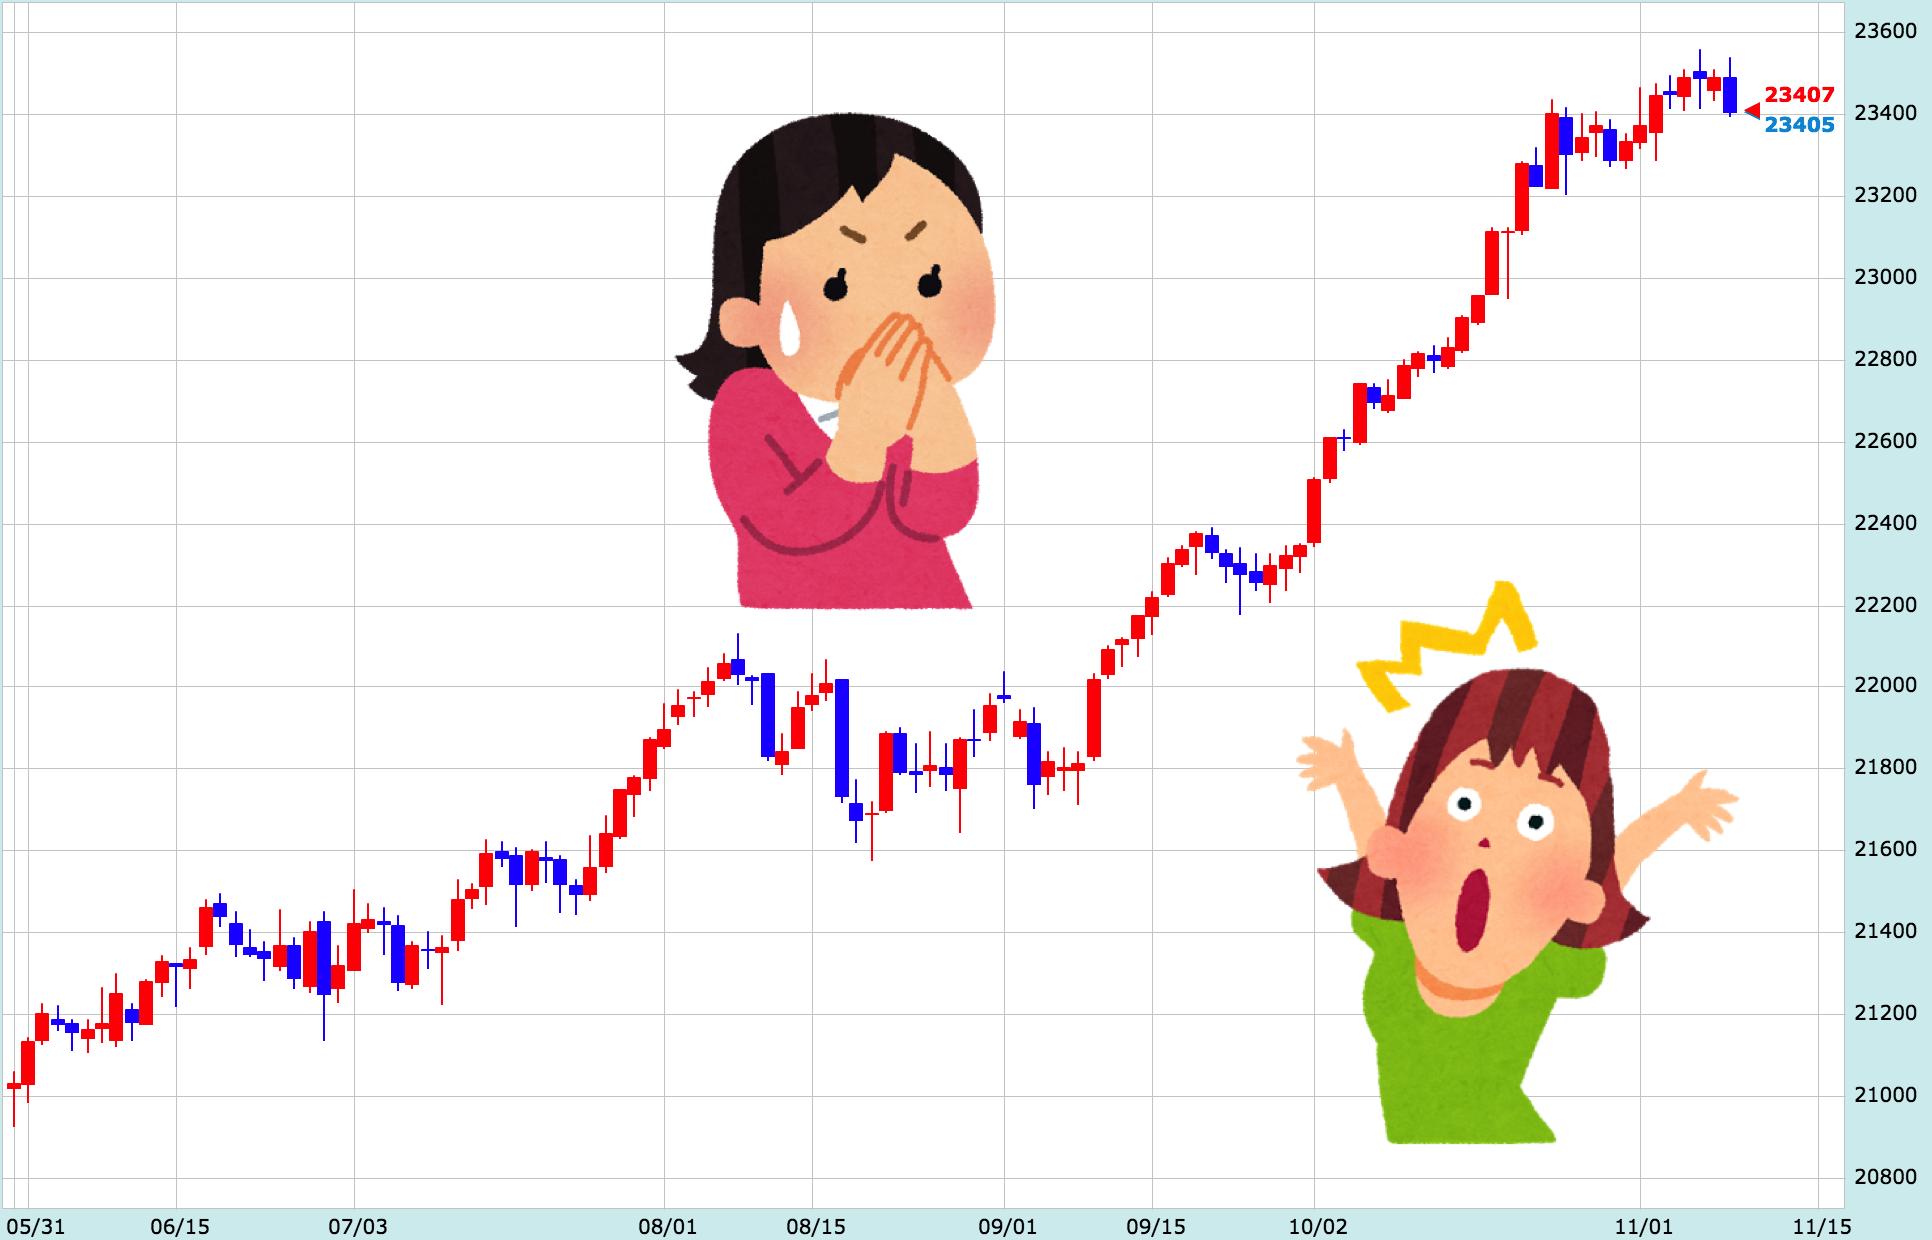 【LIVE速報】ダウ先の下落でリスクオフ!ドル円やや下落で今後の展開は?【11月9日】